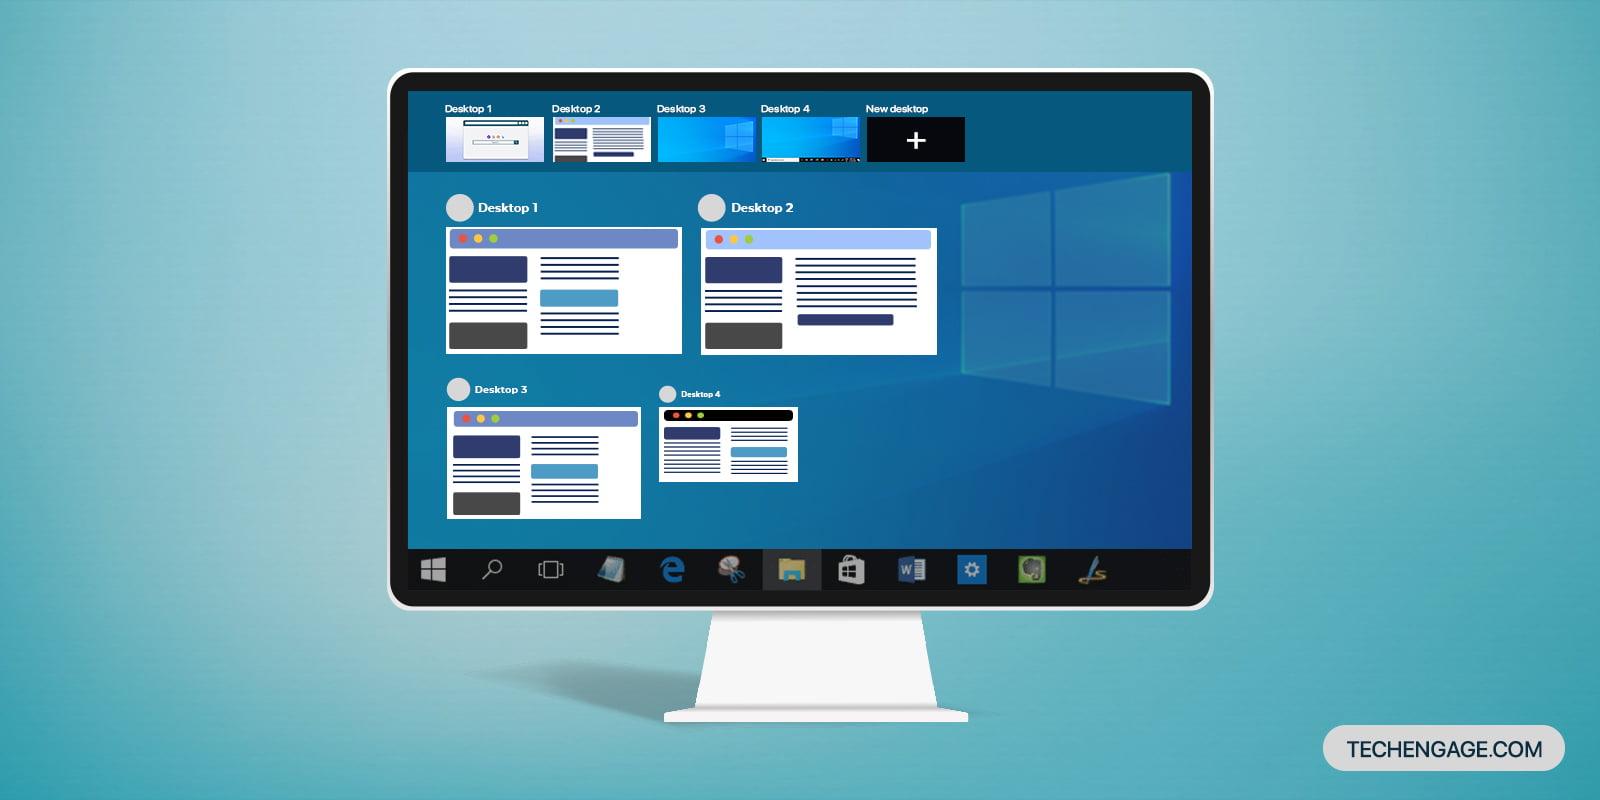 How to use multiple desktops in Windows 10